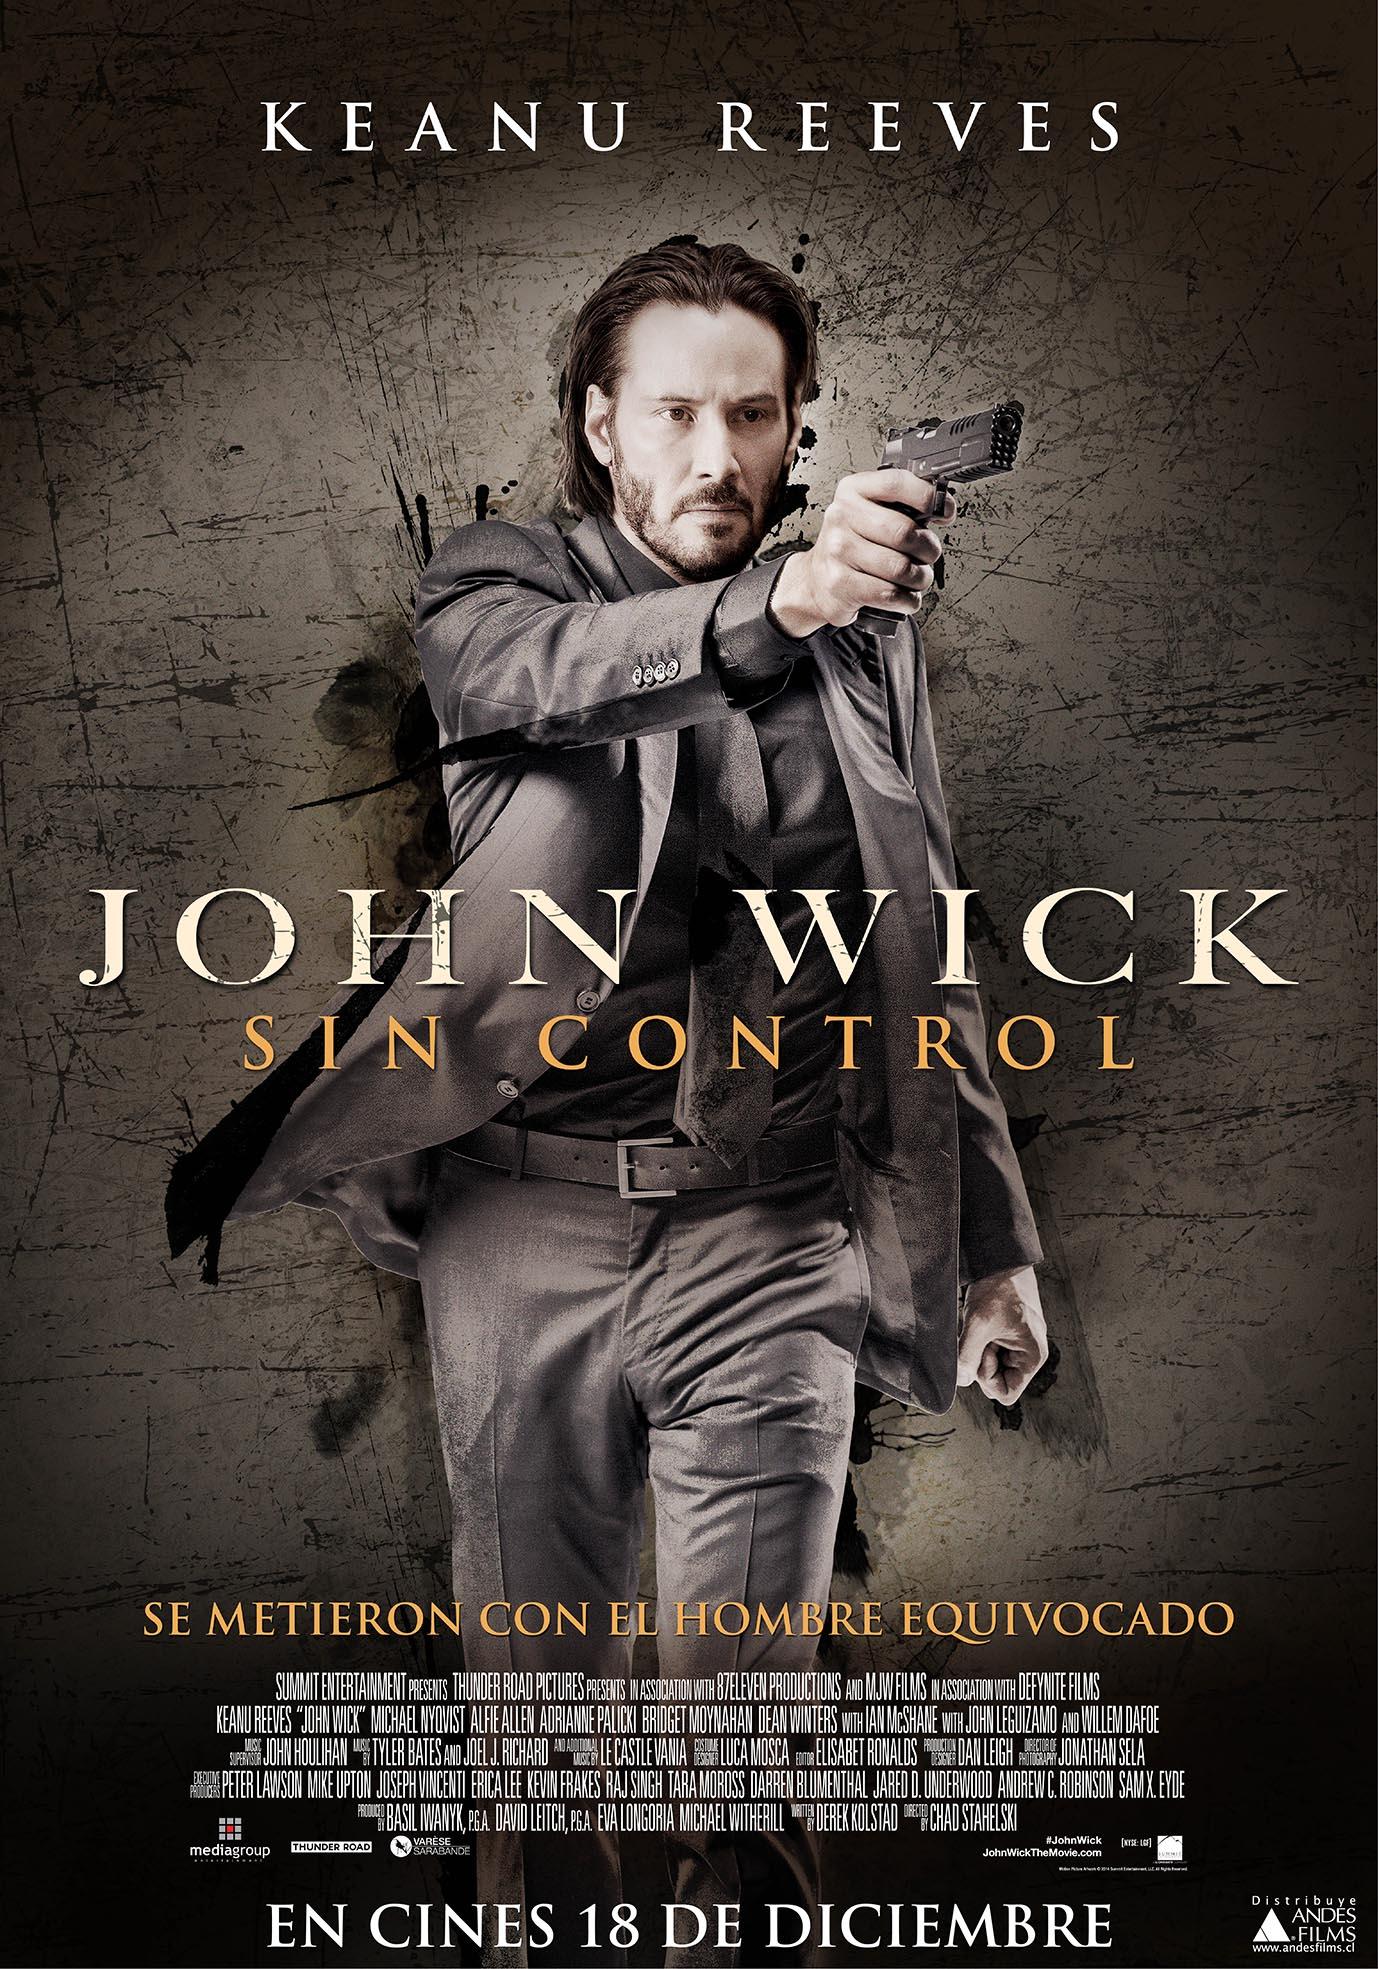 http://www.andesfilms.com.pe/john-wick/